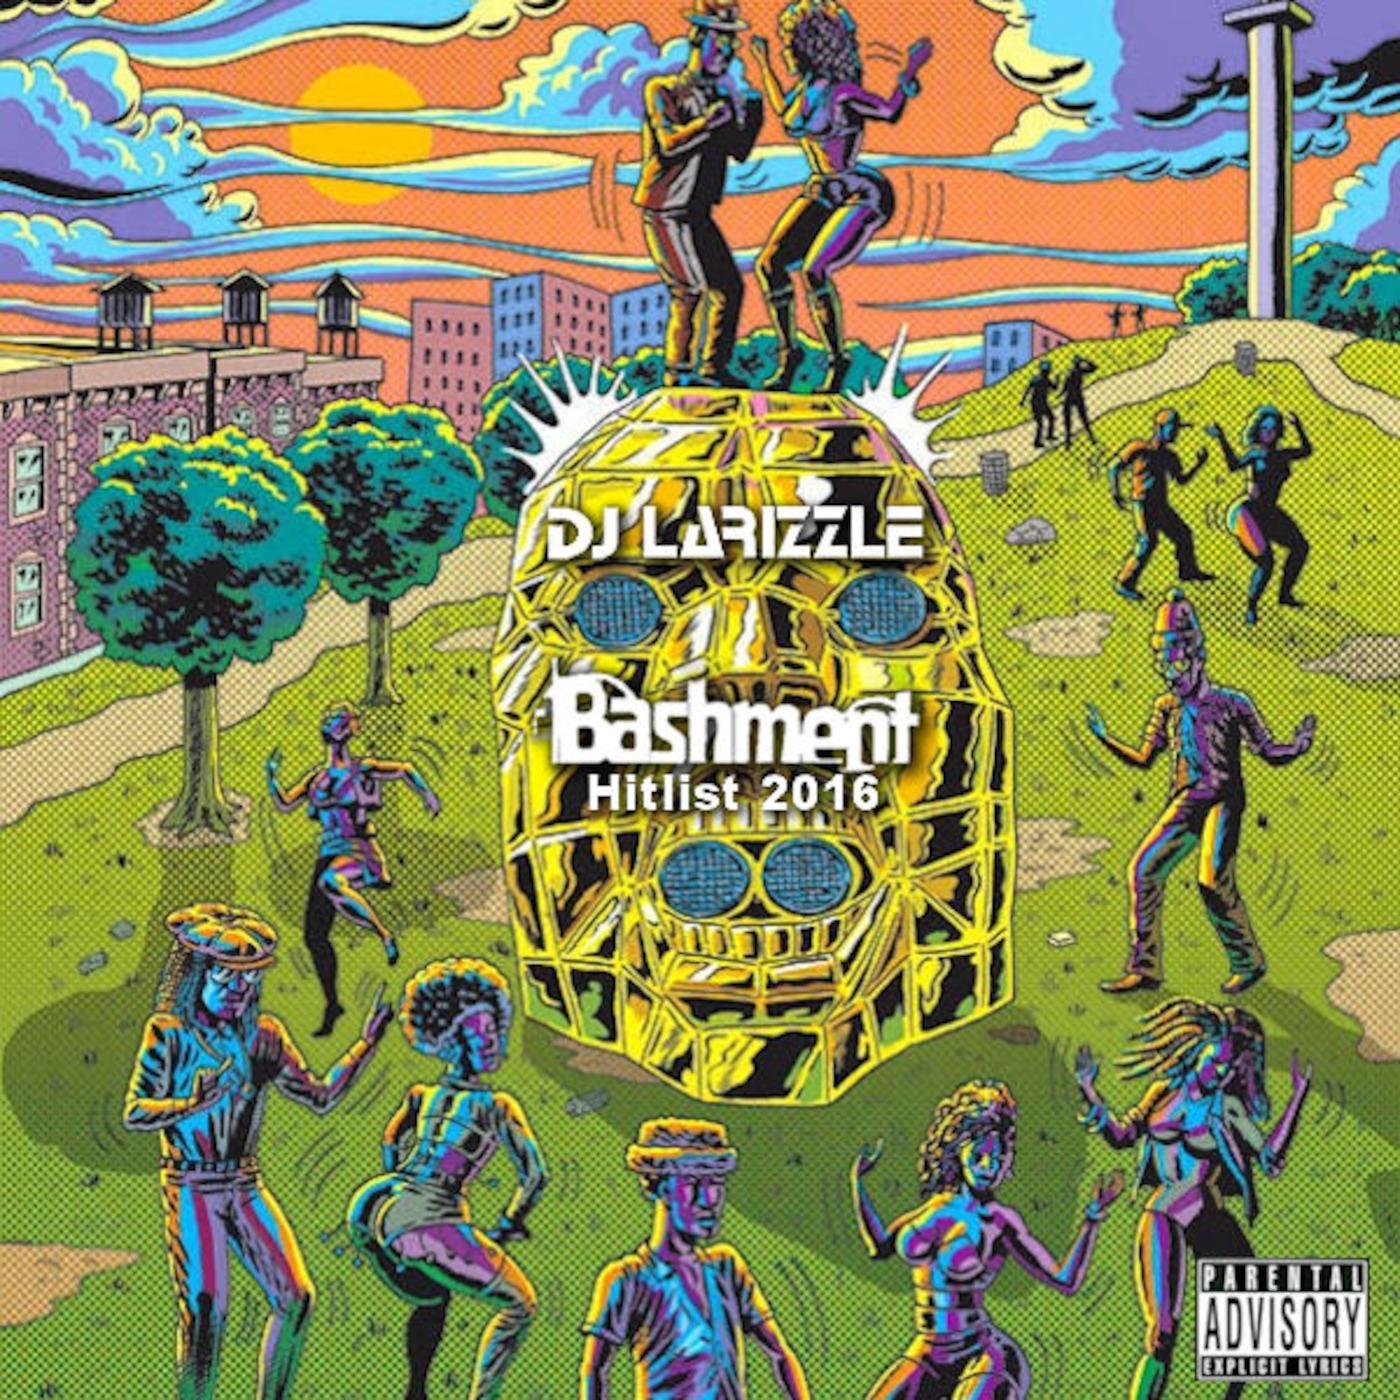 Bashment Hitlist 2016 Mixed By DJ Larizzle The DJ Larizzle podcast